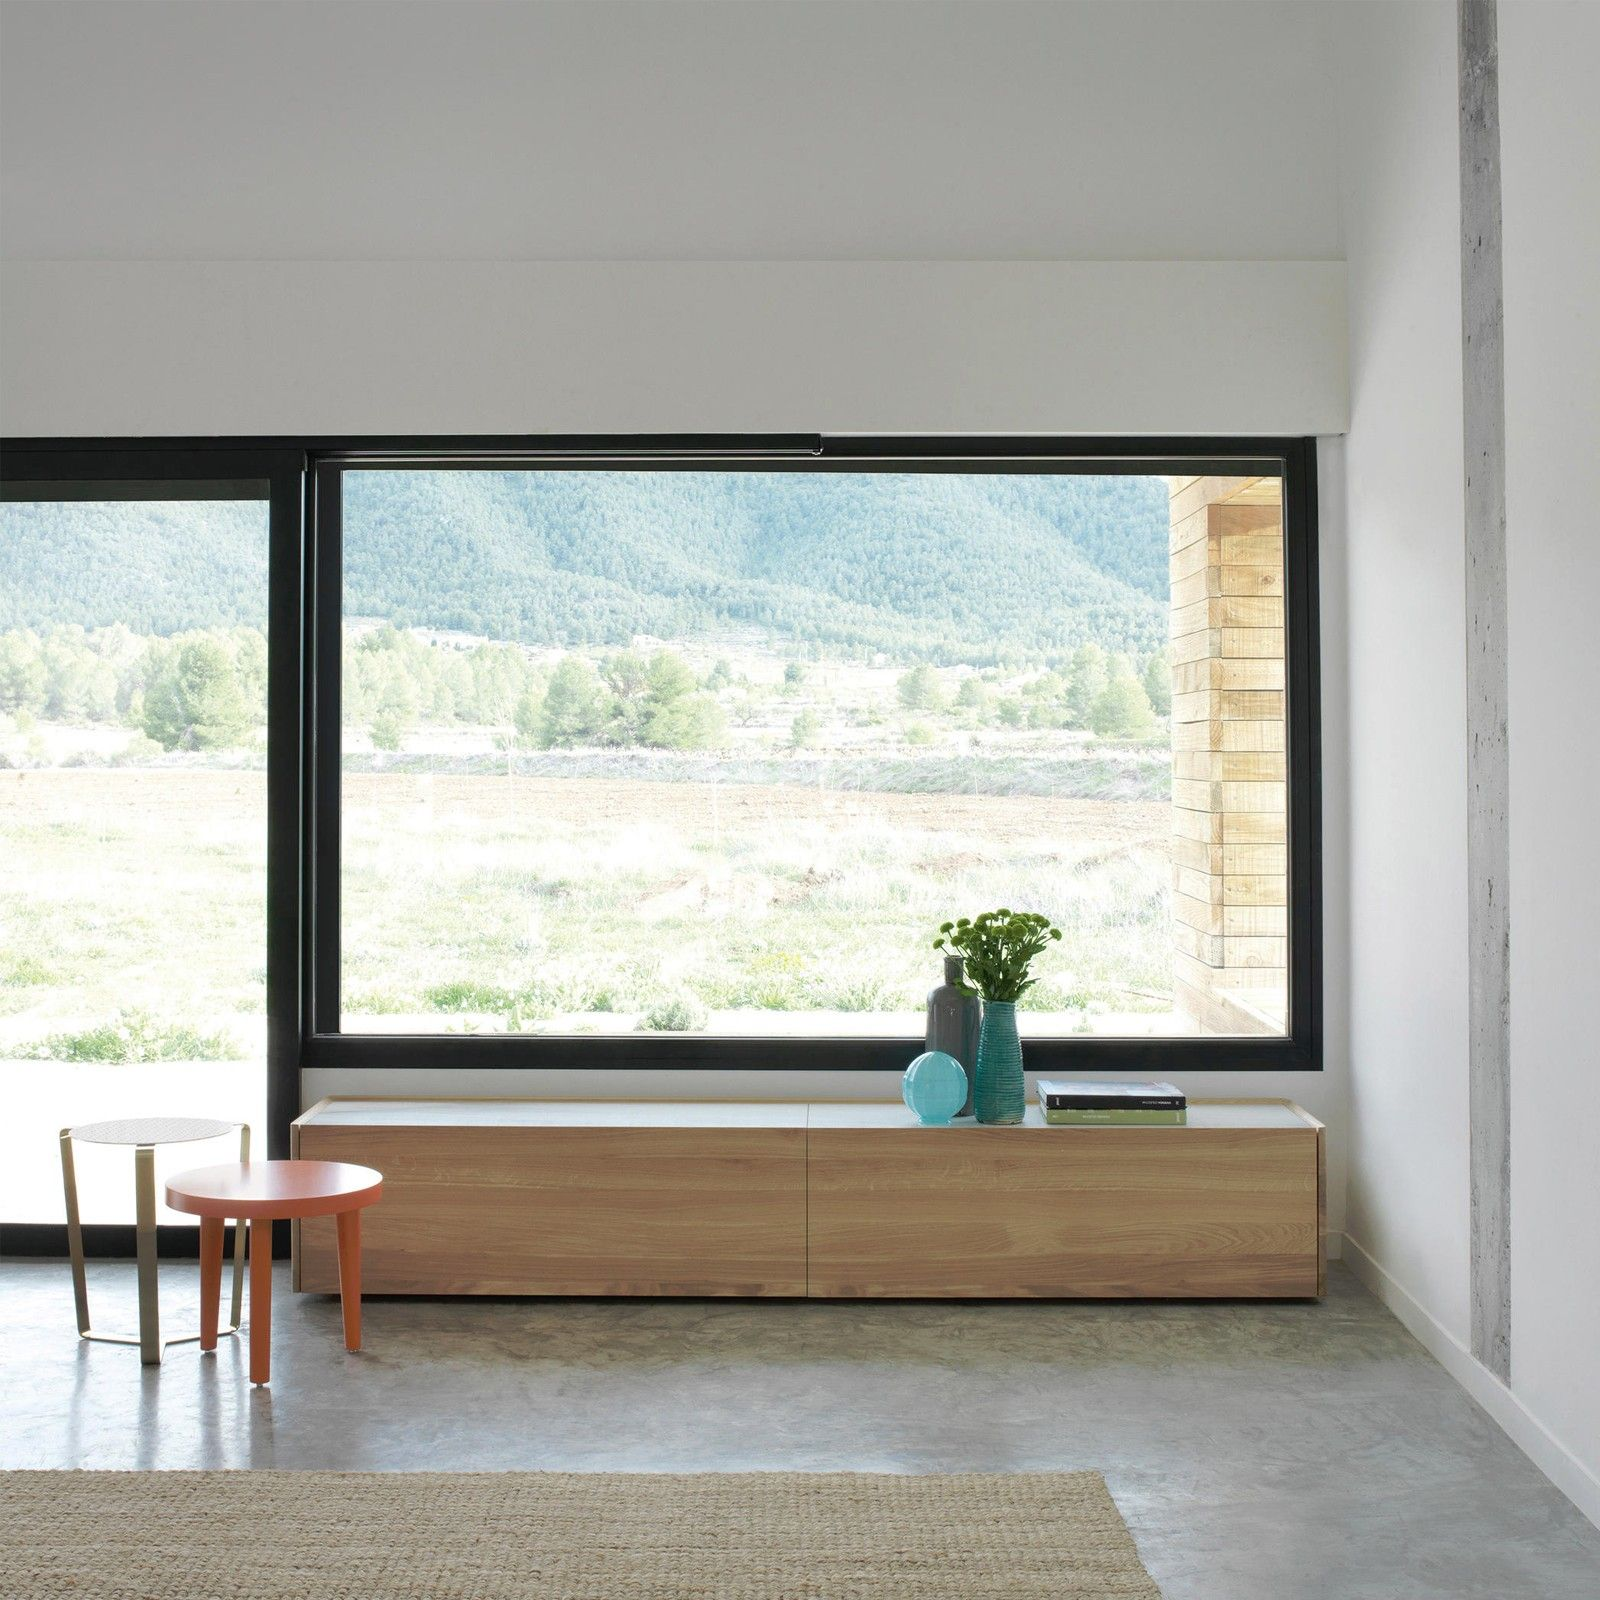 module furniture. Team TV Module By Mario Ruiz For Expormim | Interior Design, Designer Furniture, Oak Furniture L